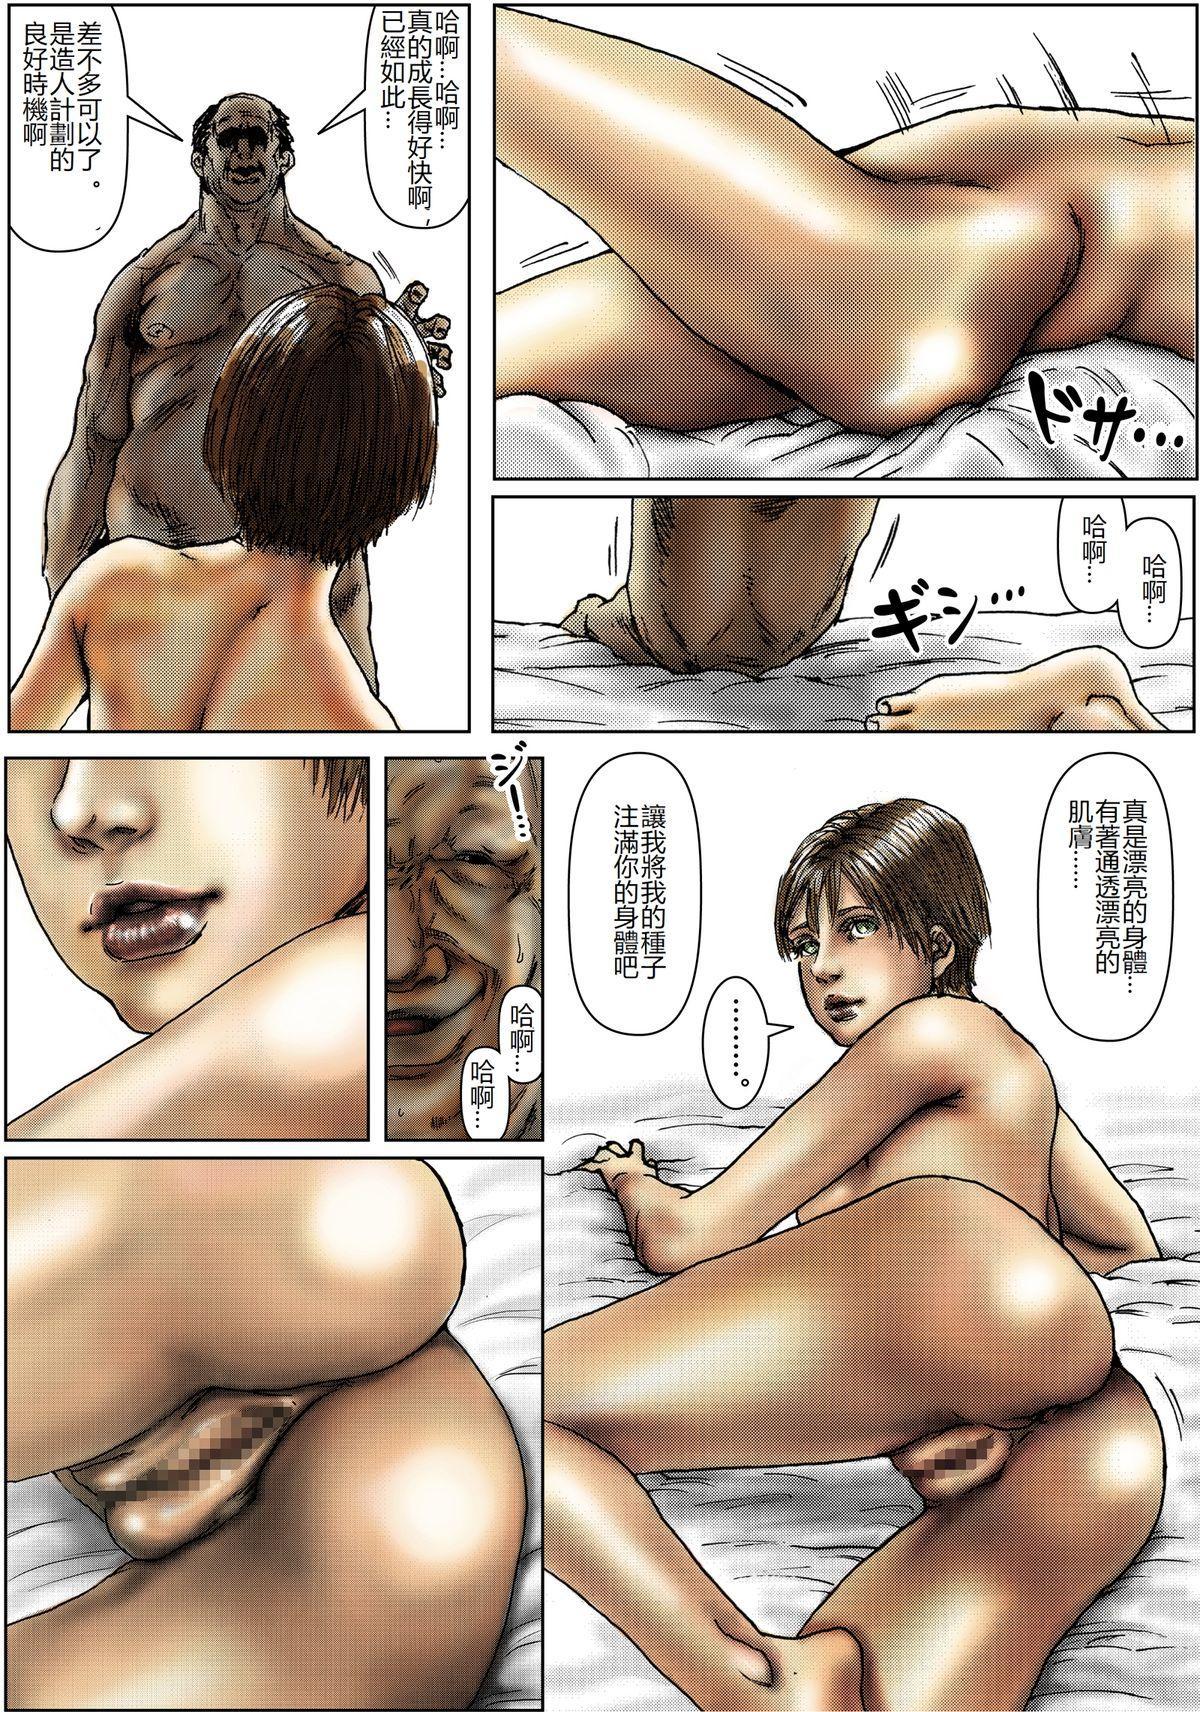 BODY HAZARD 5 Shushou Hen 7